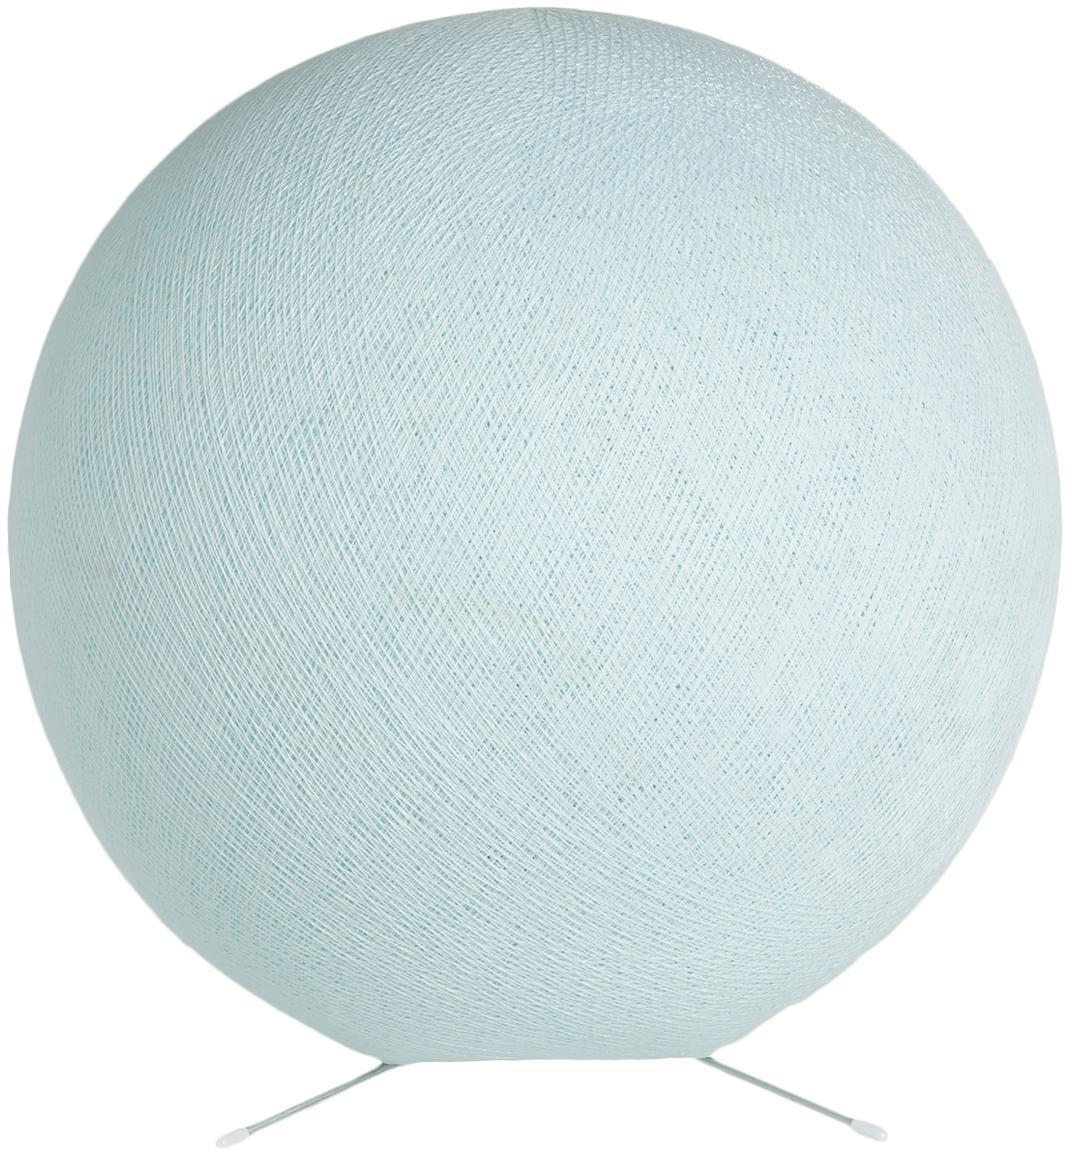 DIY Tischlampe Colorain, Lampenschirm: Polyester, Lampenfuß: Metall, Hellblau, Ø 36 cm